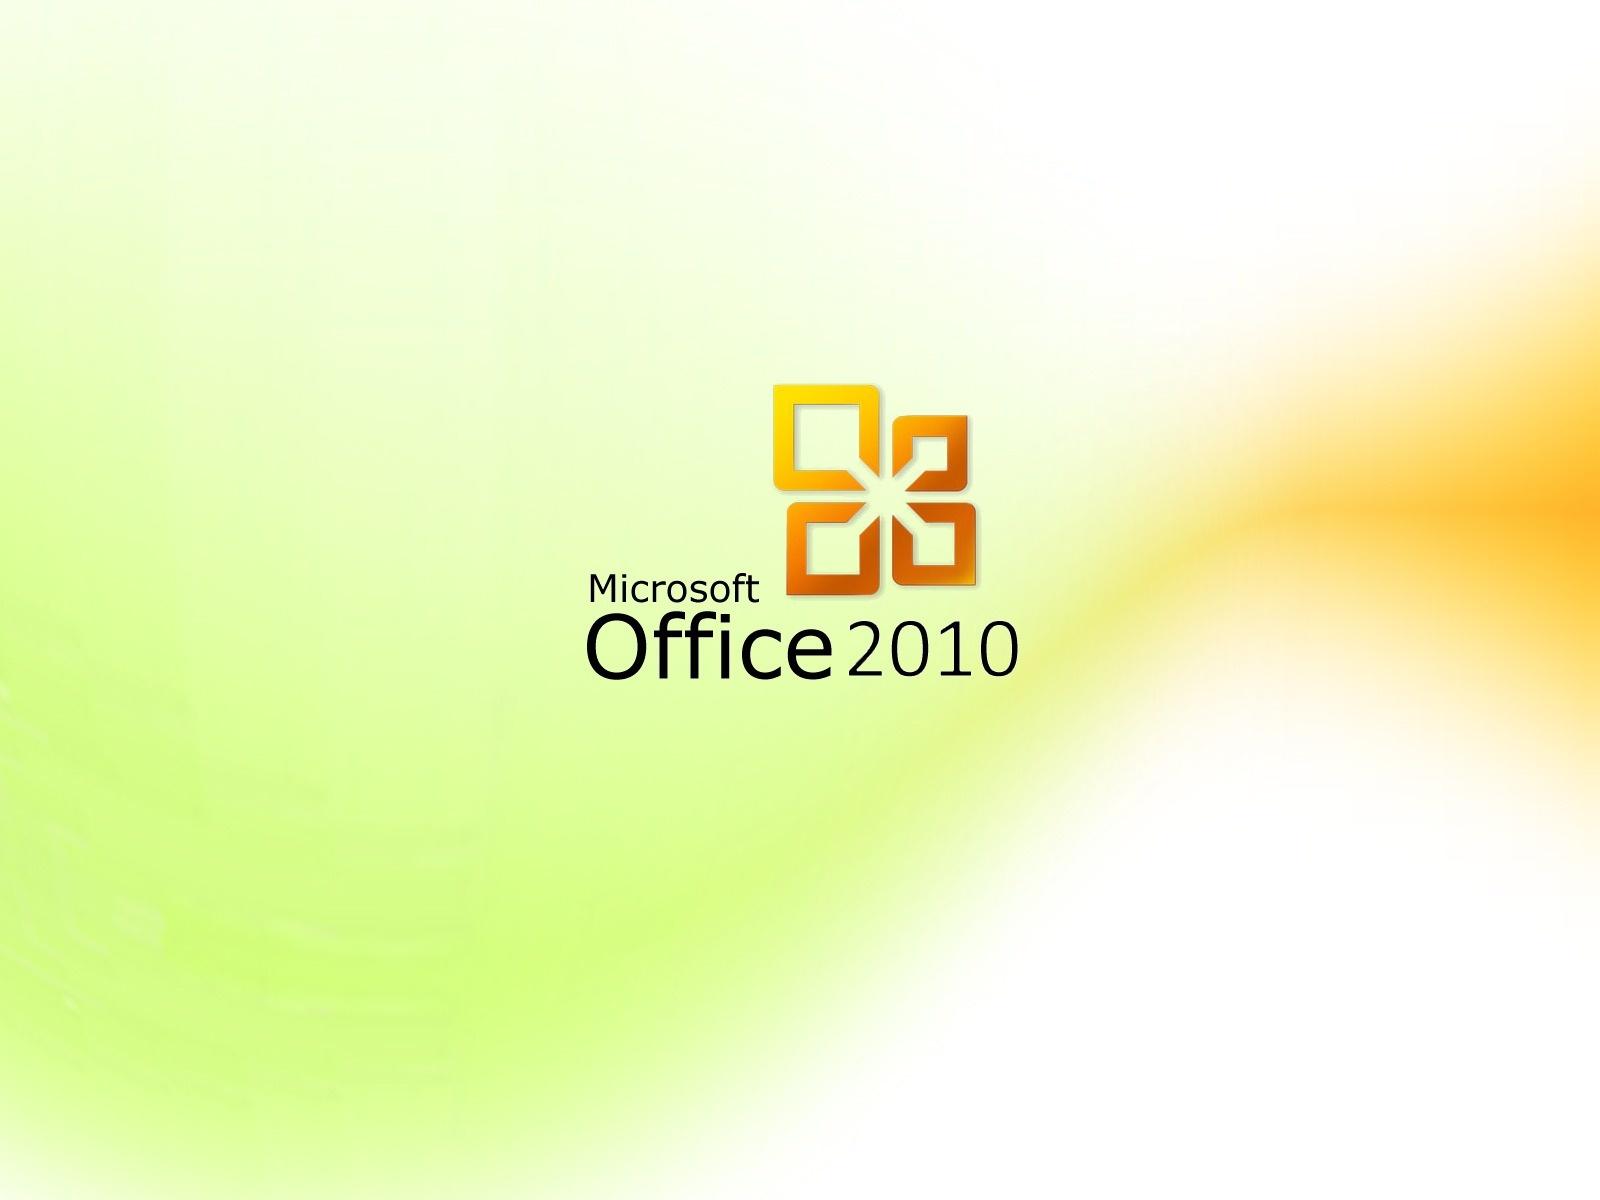 10 HD Microsoft Office 2010 Wallpaper Tam Super 1600x1200